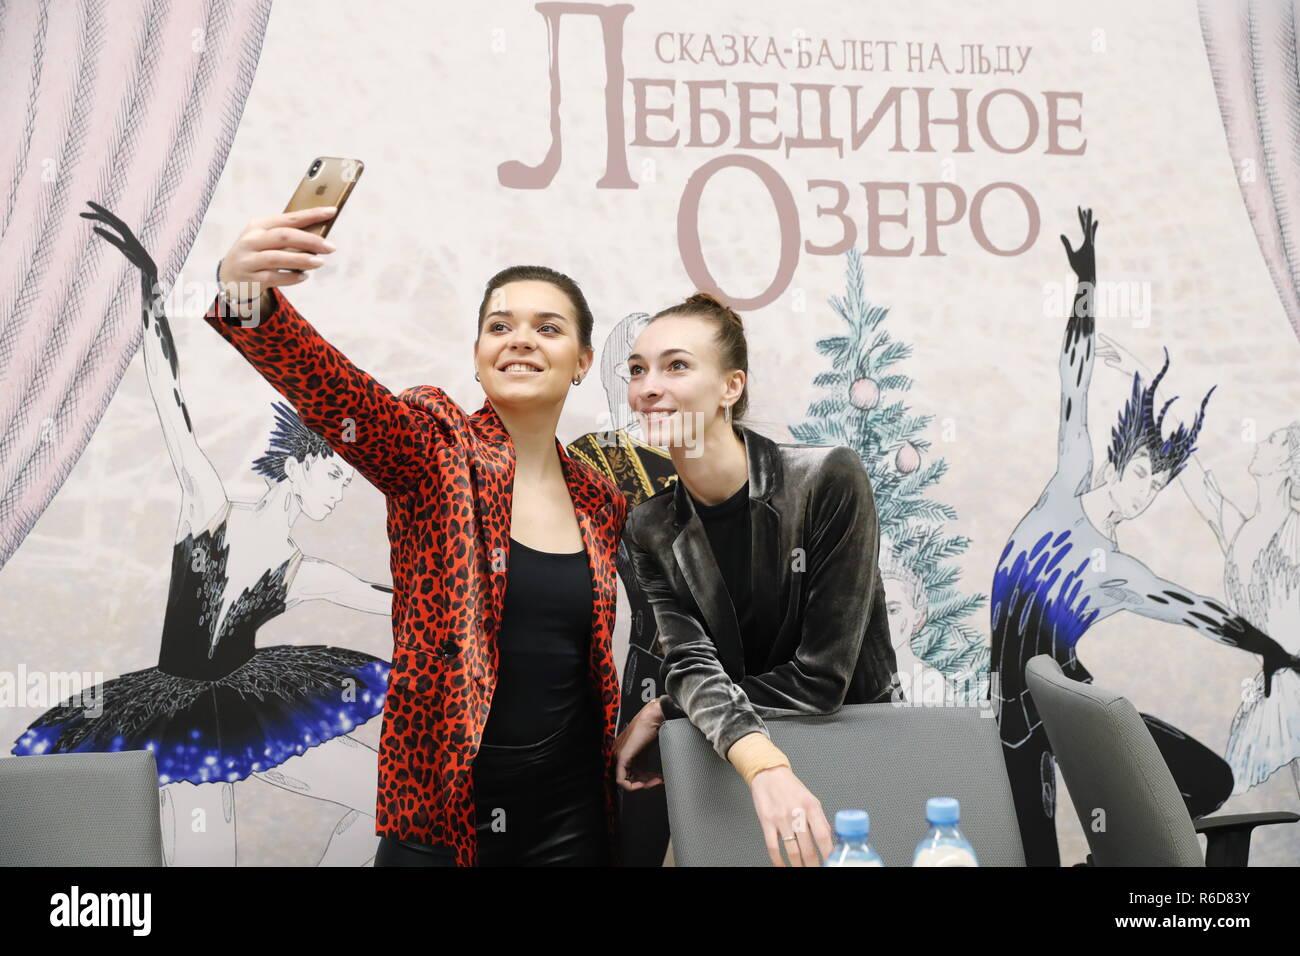 Selfie Yana Sotnikova nude photos 2019